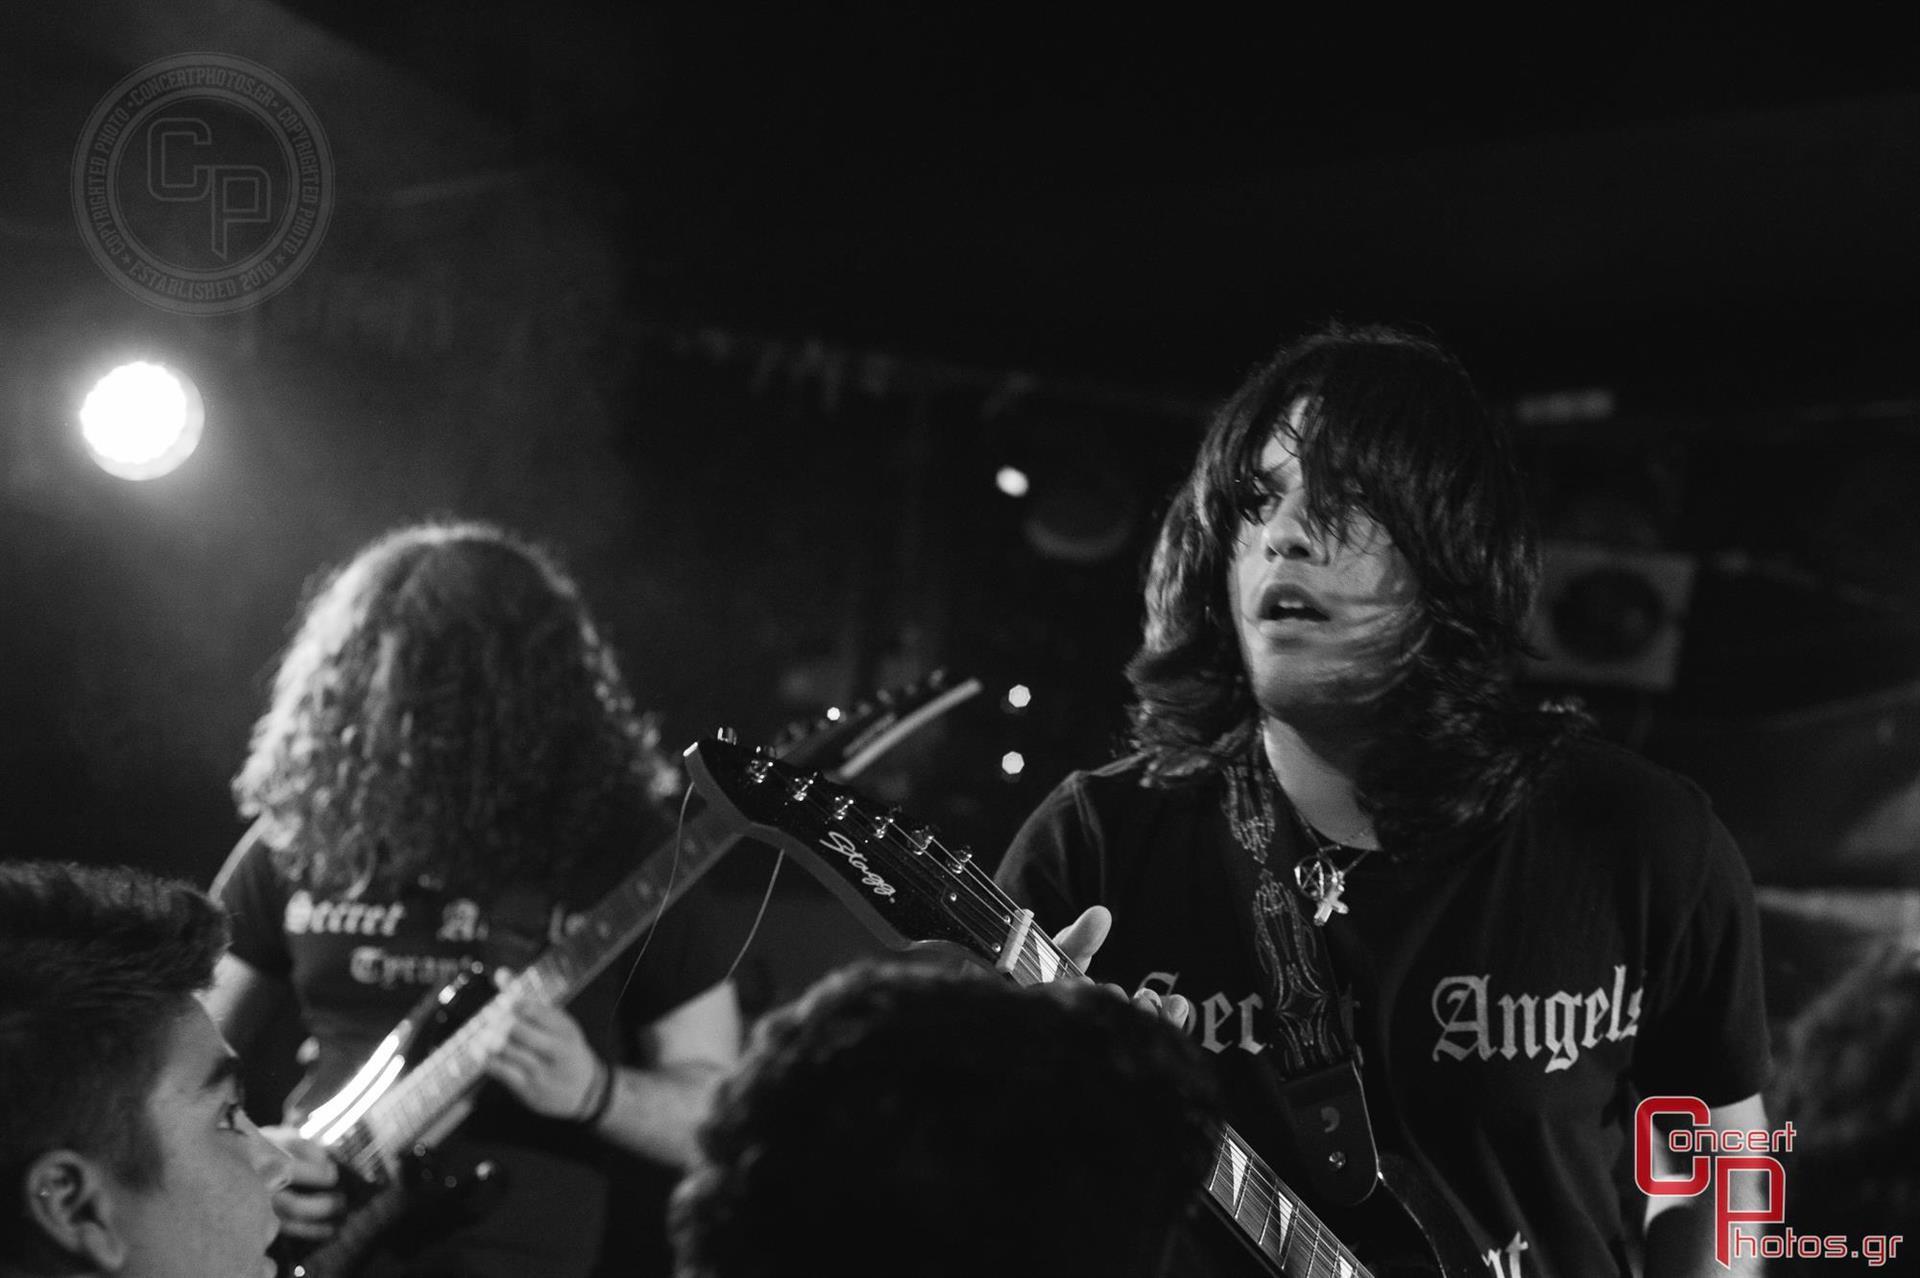 Battle Of The Bands Athens - Leg 3- photographer:  - ConcertPhotos - 20150104_2332_43